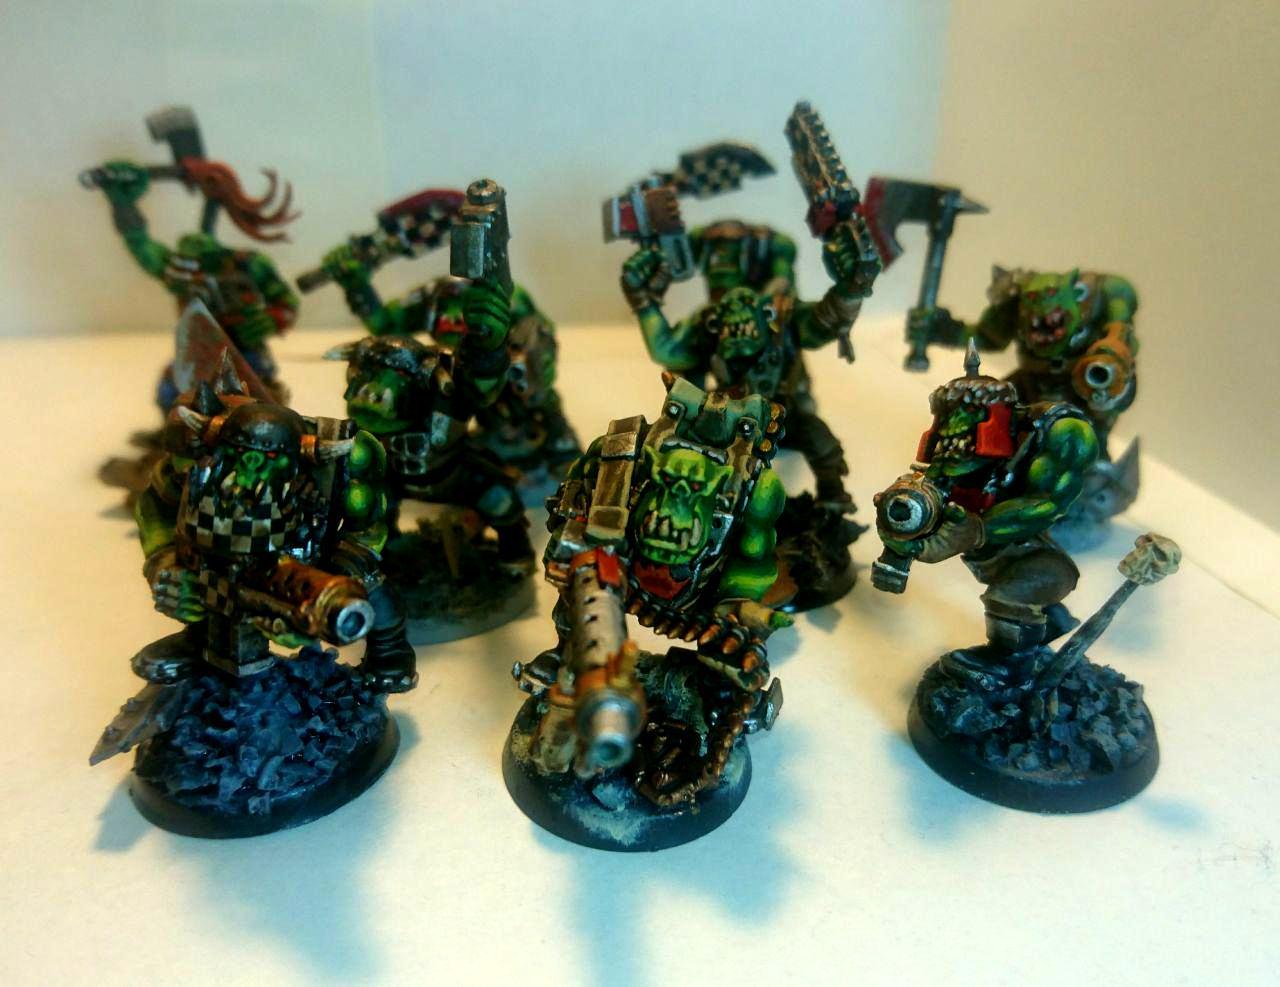 Boy, Conversion, Goffs, Nob, Ork Boy, Ork Conversion, Ork Goff Boy, Orks, Space Orks, Warhammer 40,000